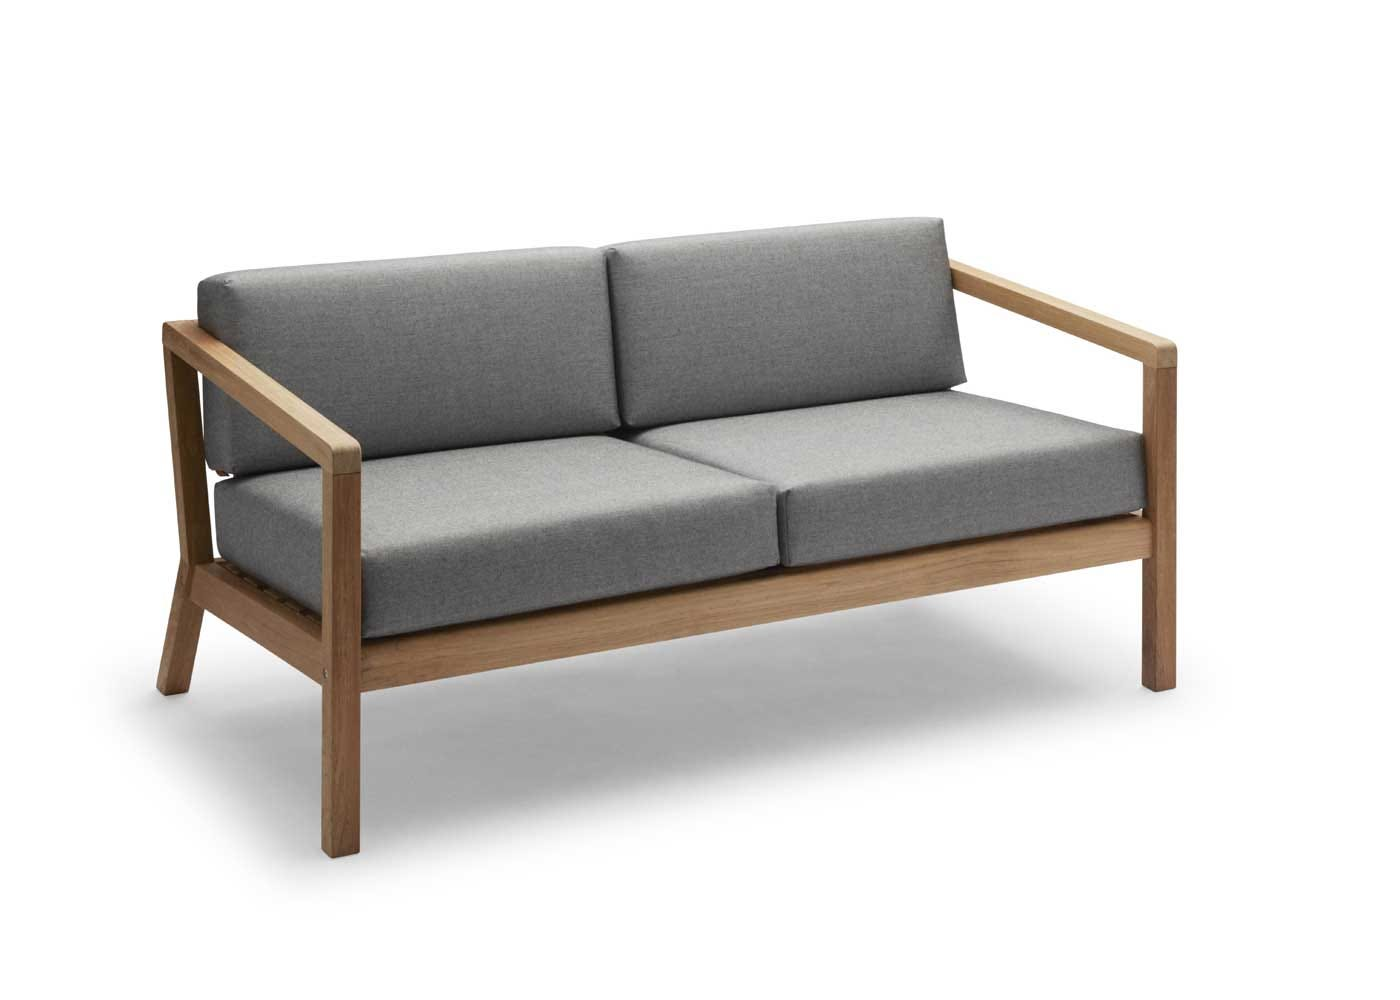 Virkelyst outdoor sofa ash grey